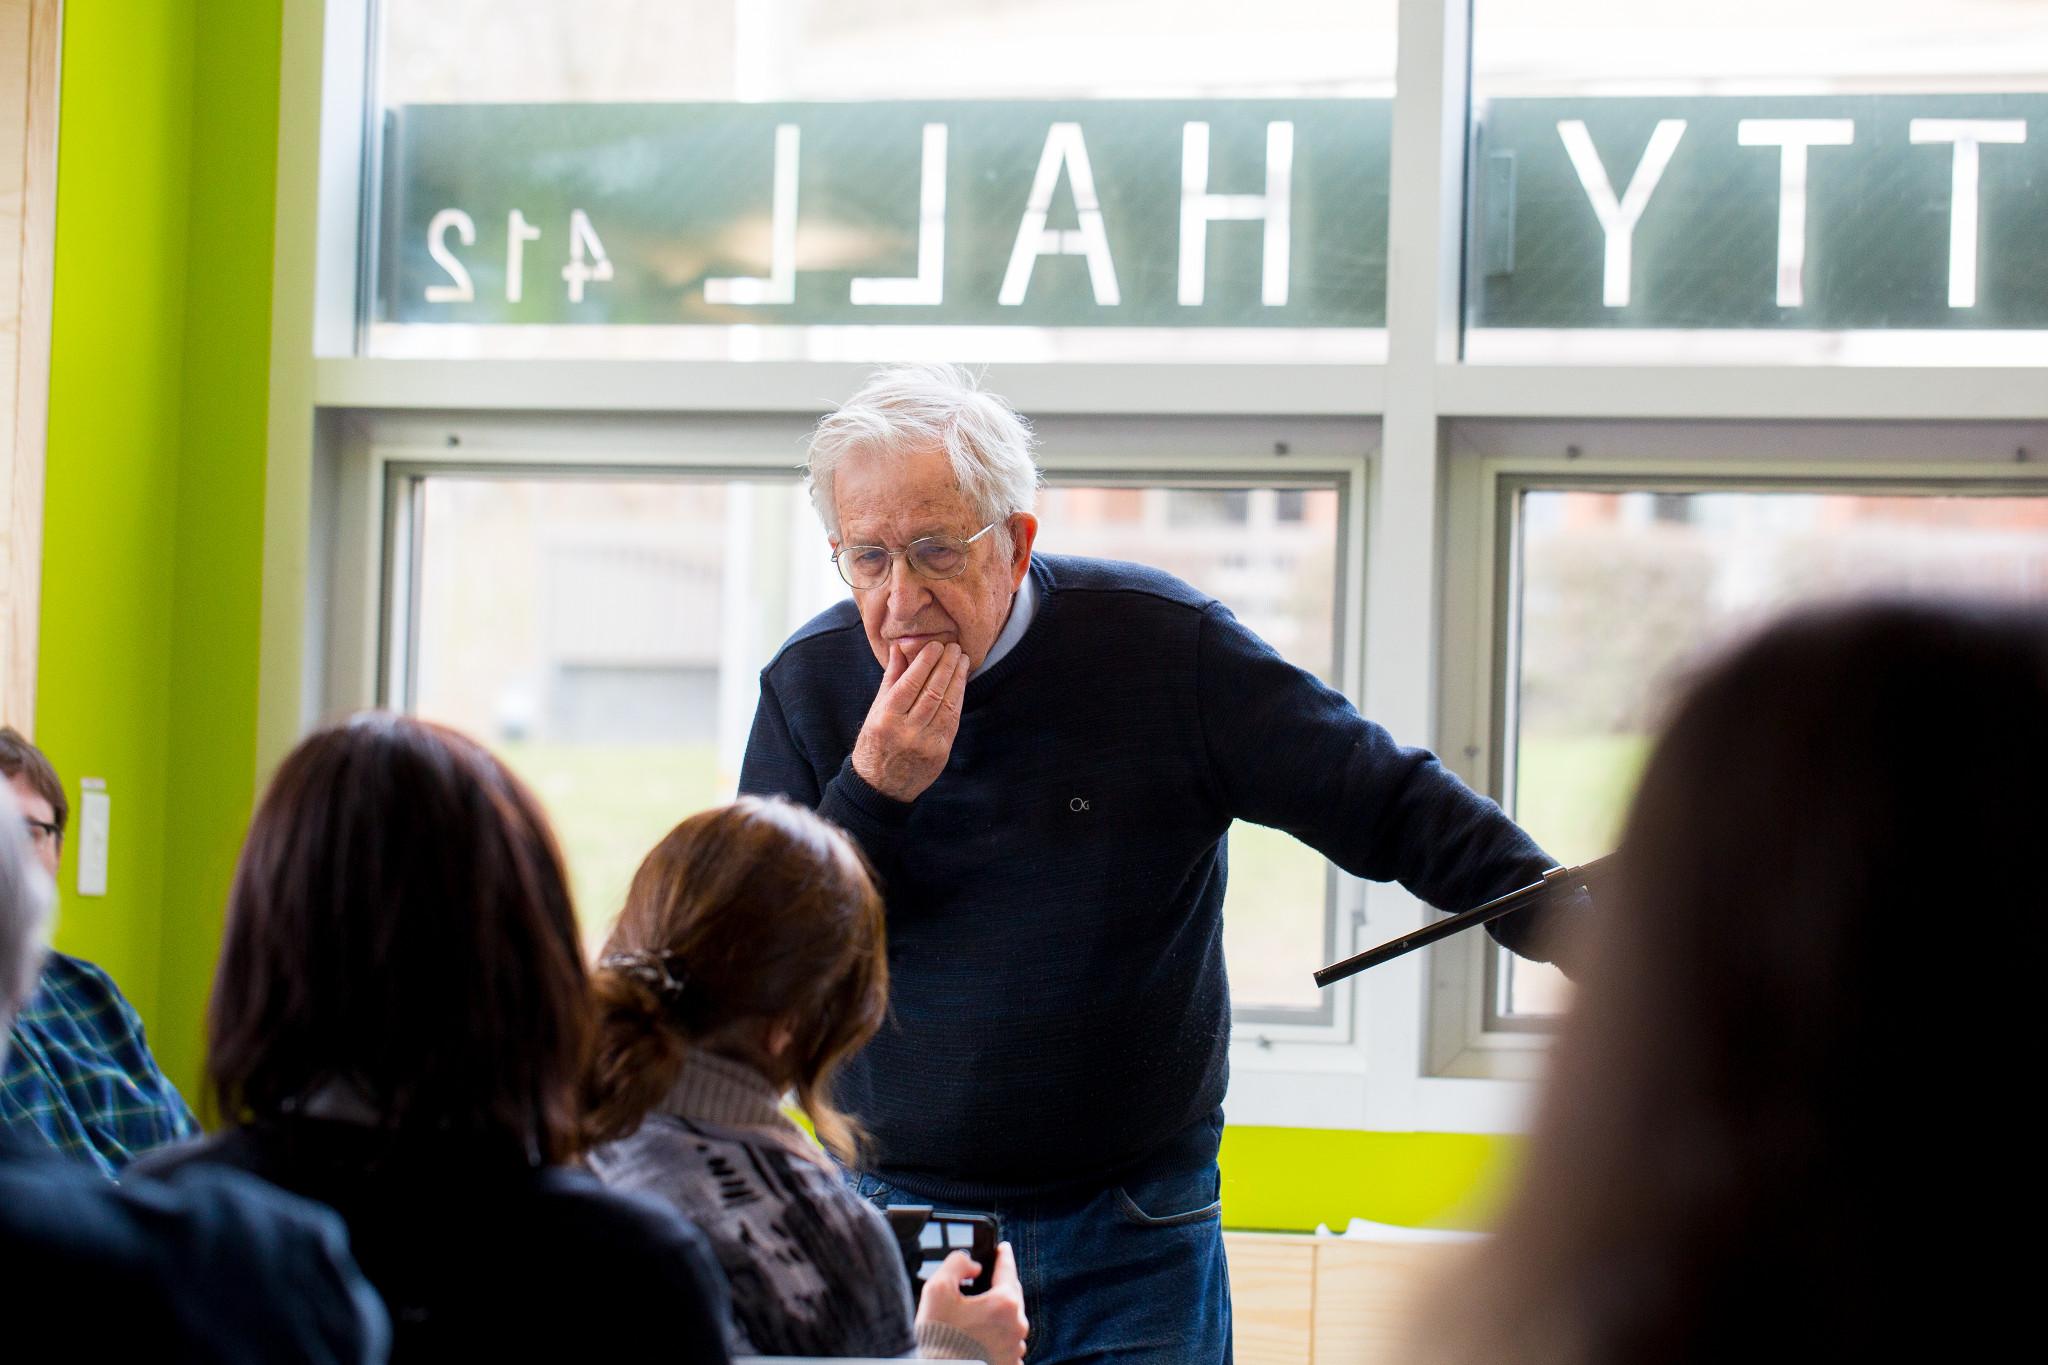 Noam Chomsky at UMass Amherst